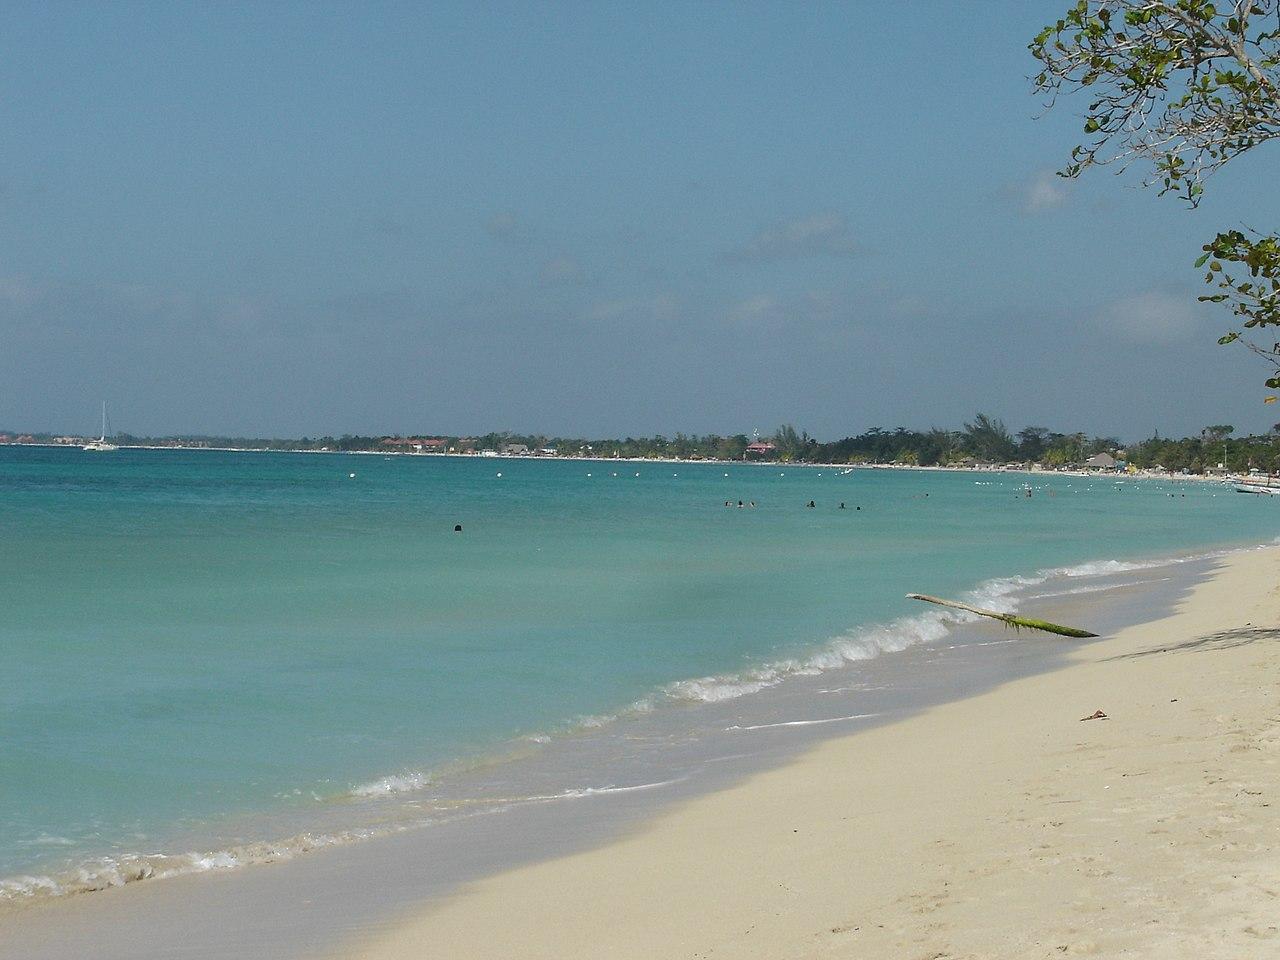 las mejores playas del mundo: Seven Mile Beach, Negril, Jamaica